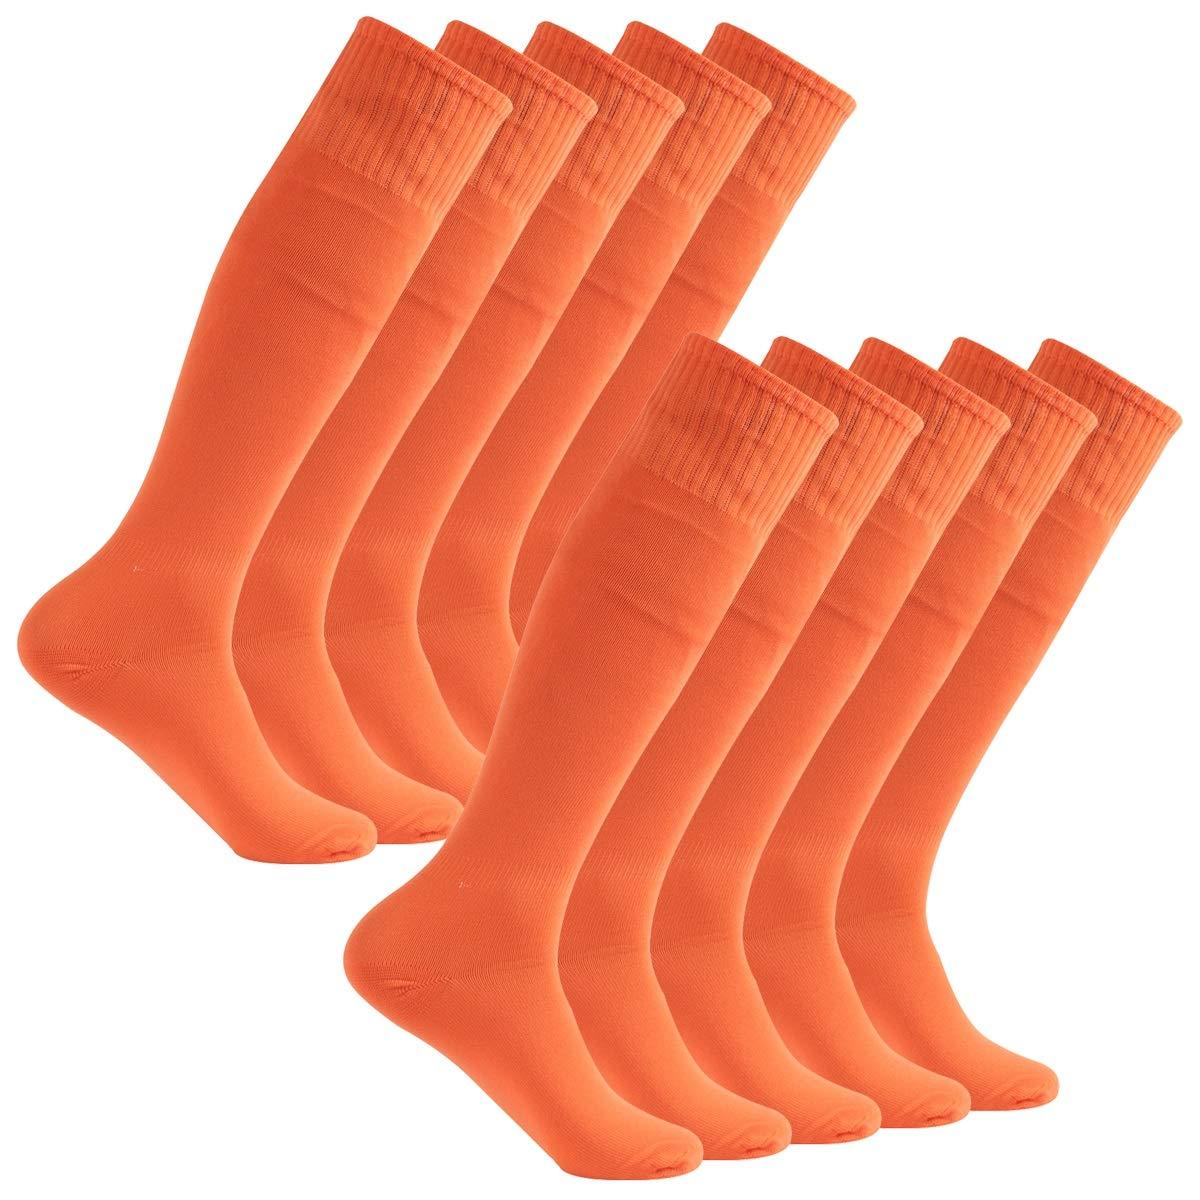 Feelingway Unsiex Knee High Athletic Soccer socks 10 Pairs Orange by Atrest